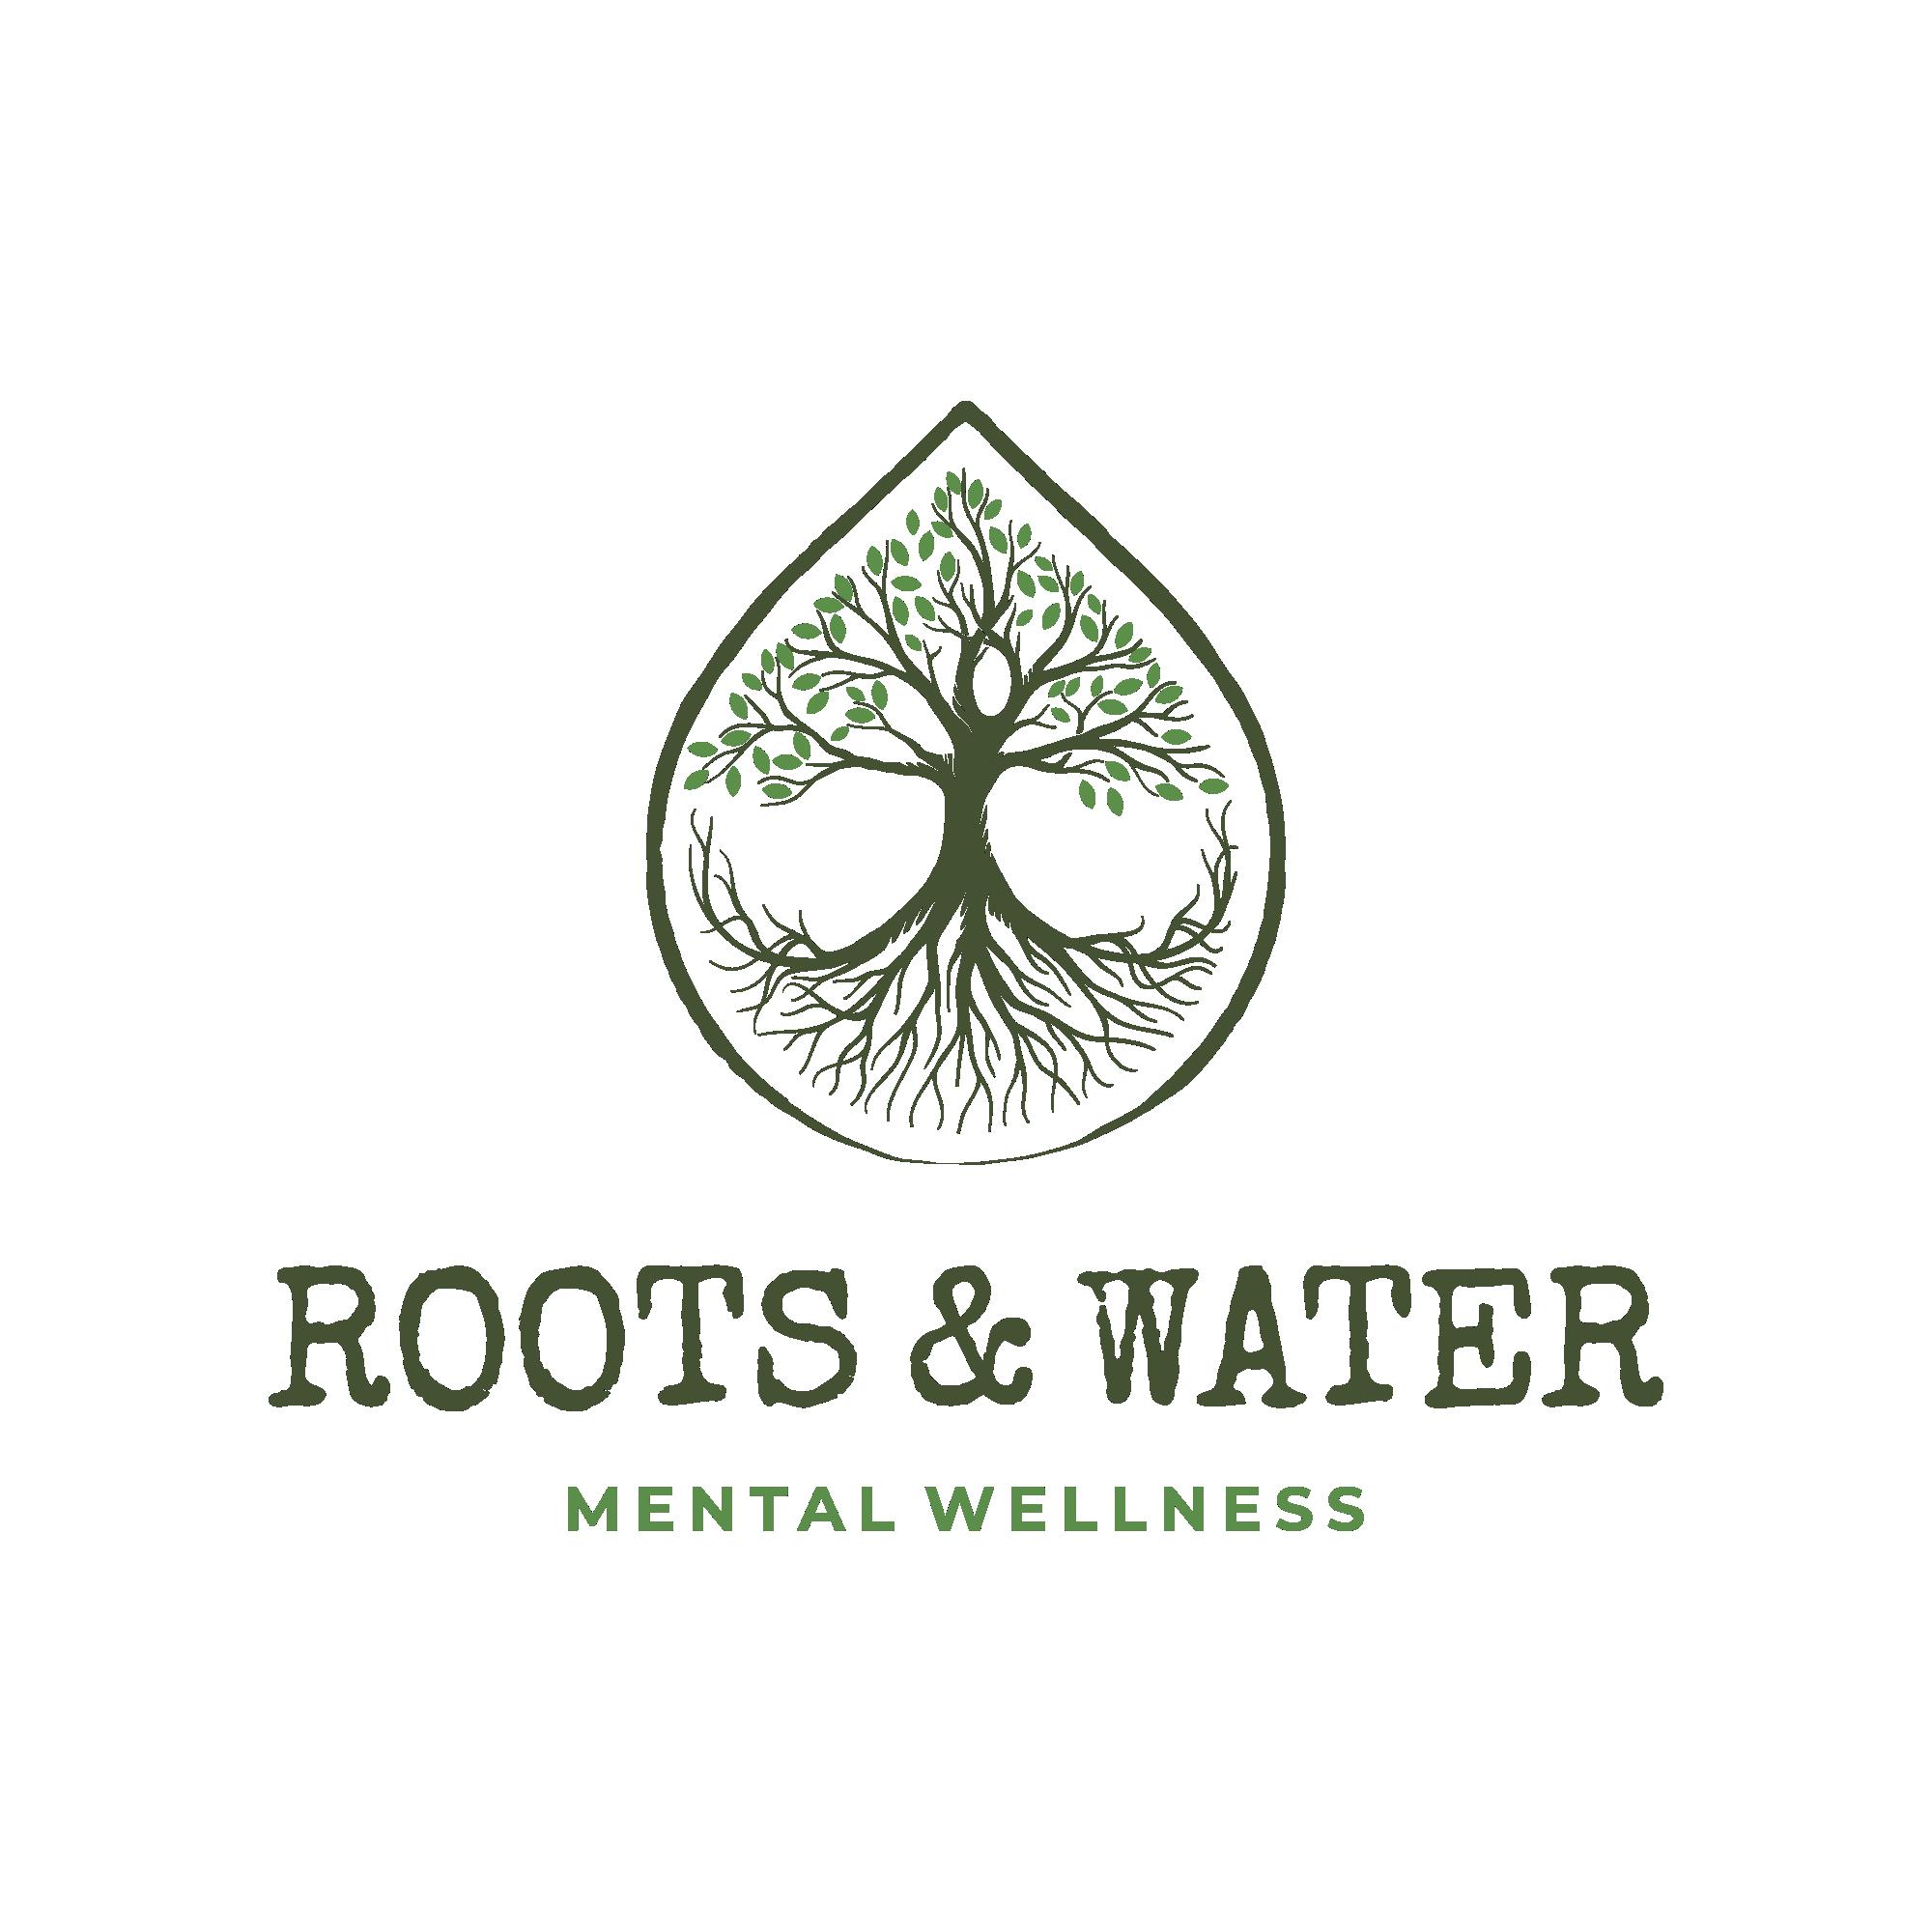 Creative logo design for mental health awareness and wellness organization